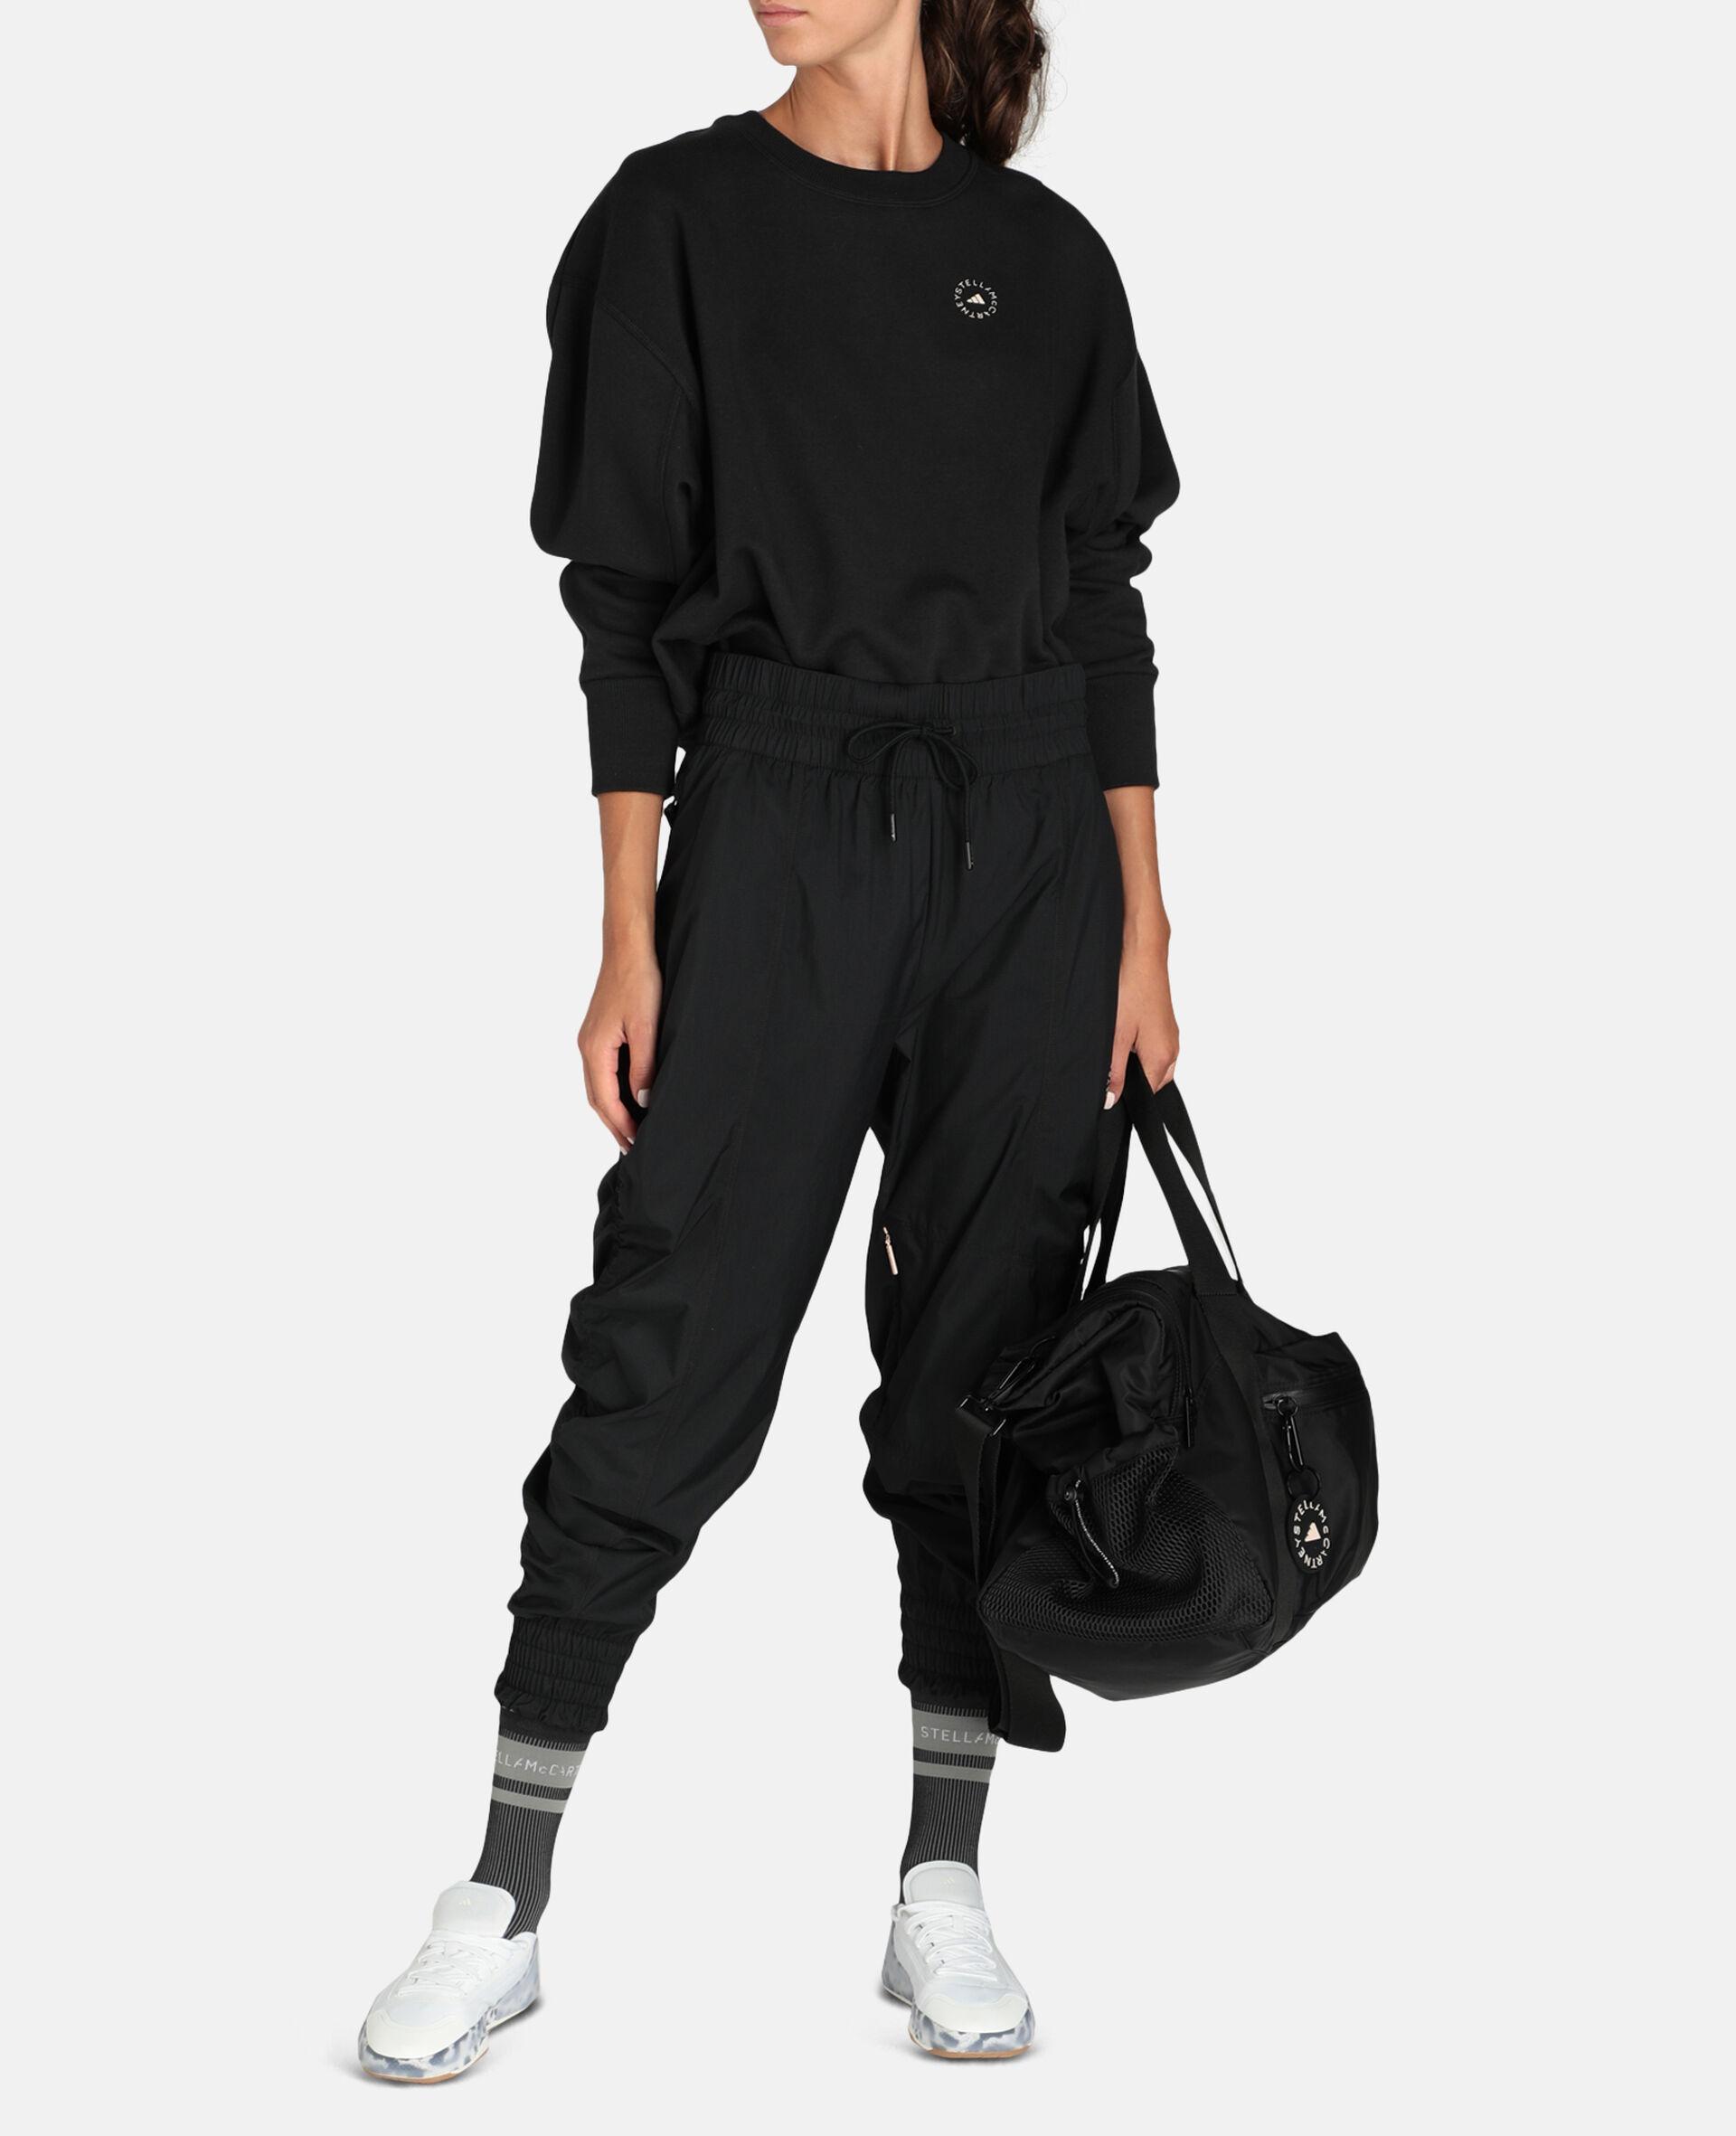 Black Woven Training Pants-Black-large image number 1